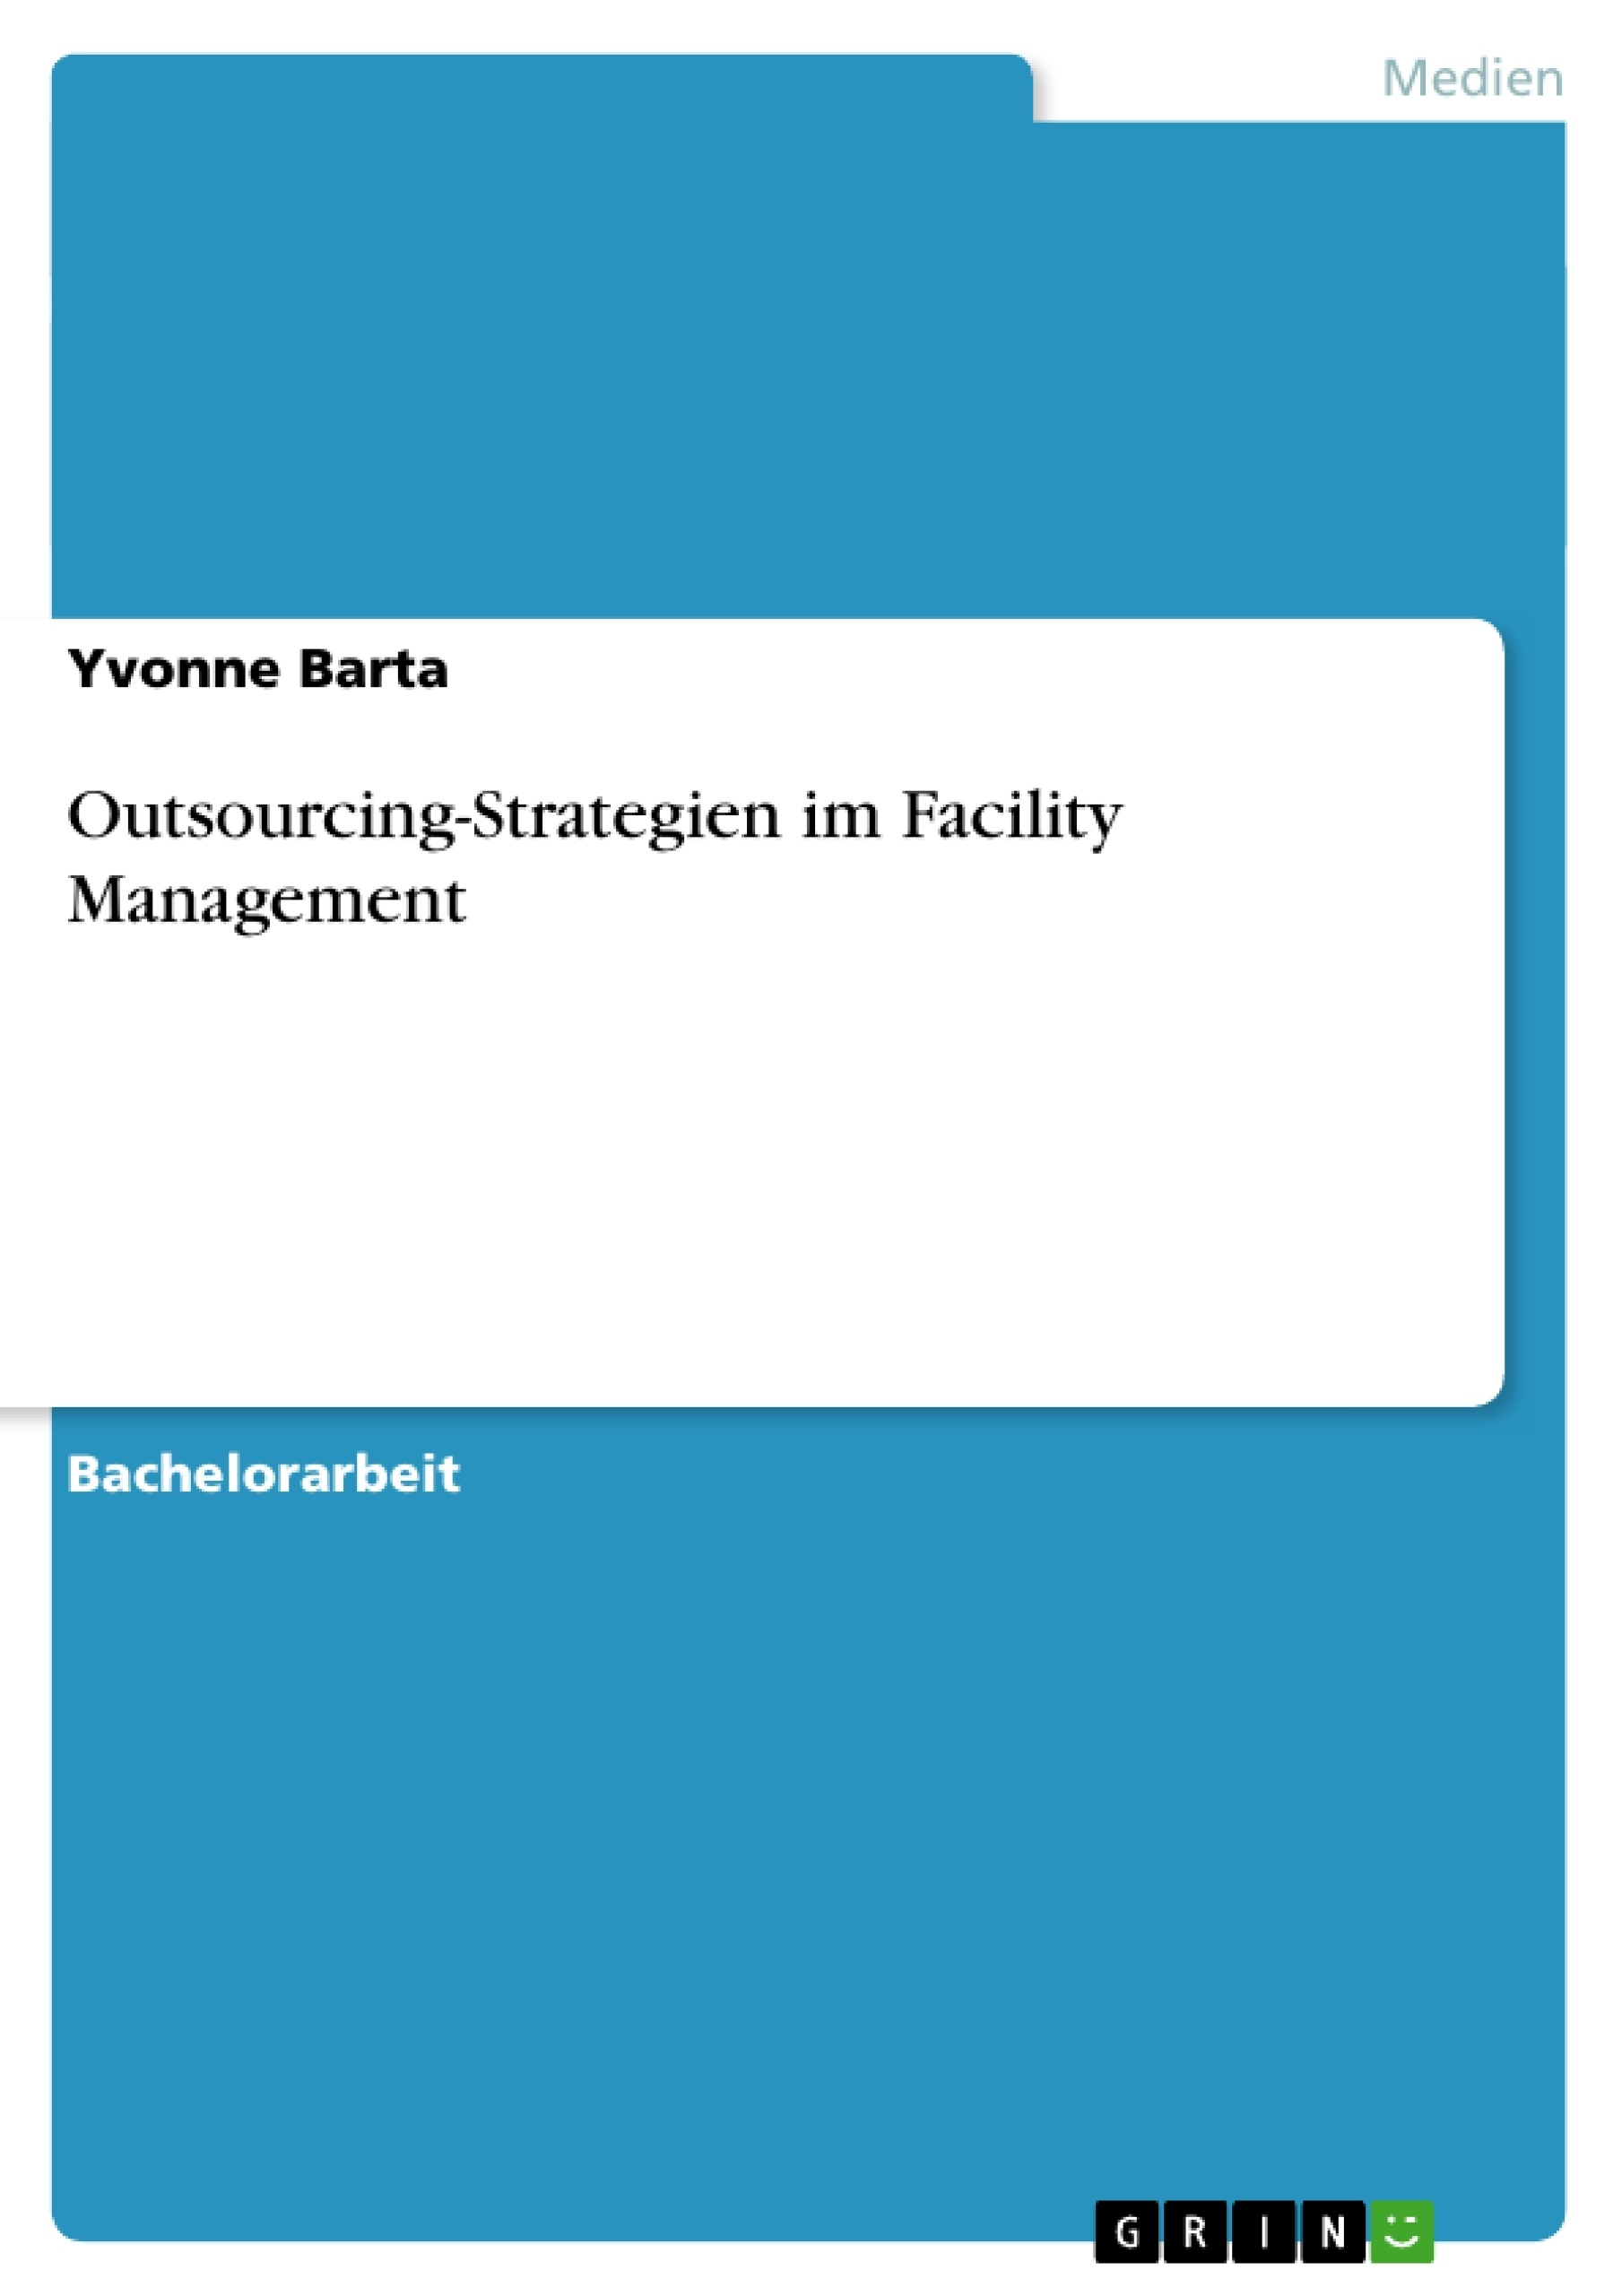 Titel: Outsourcing-Strategien im Facility Management